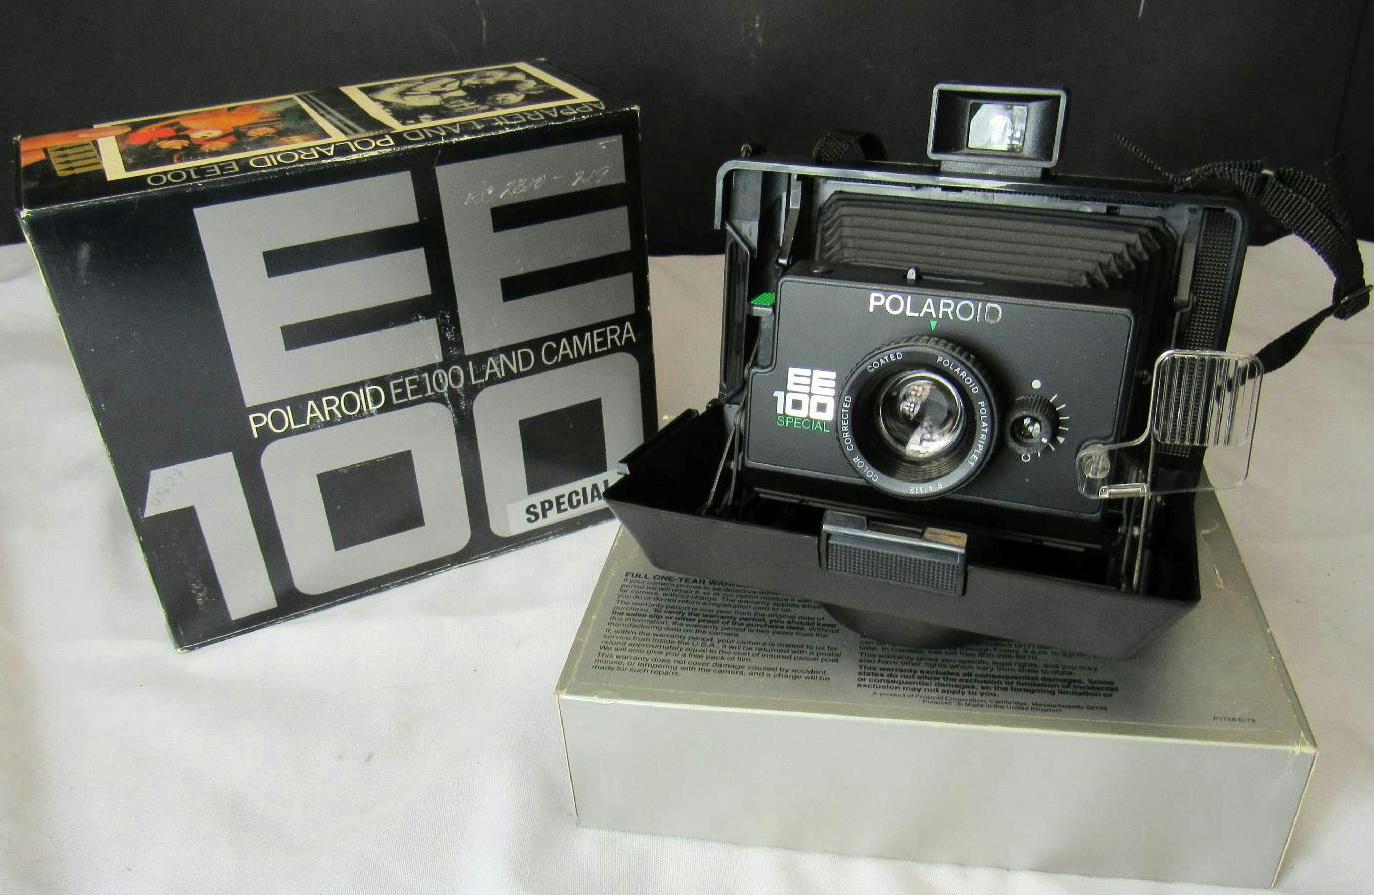 Polaroid Ee100 Manual Auto Electrical Wiring Diagram Kawasaki Vulcan 900 For A Motorcycle